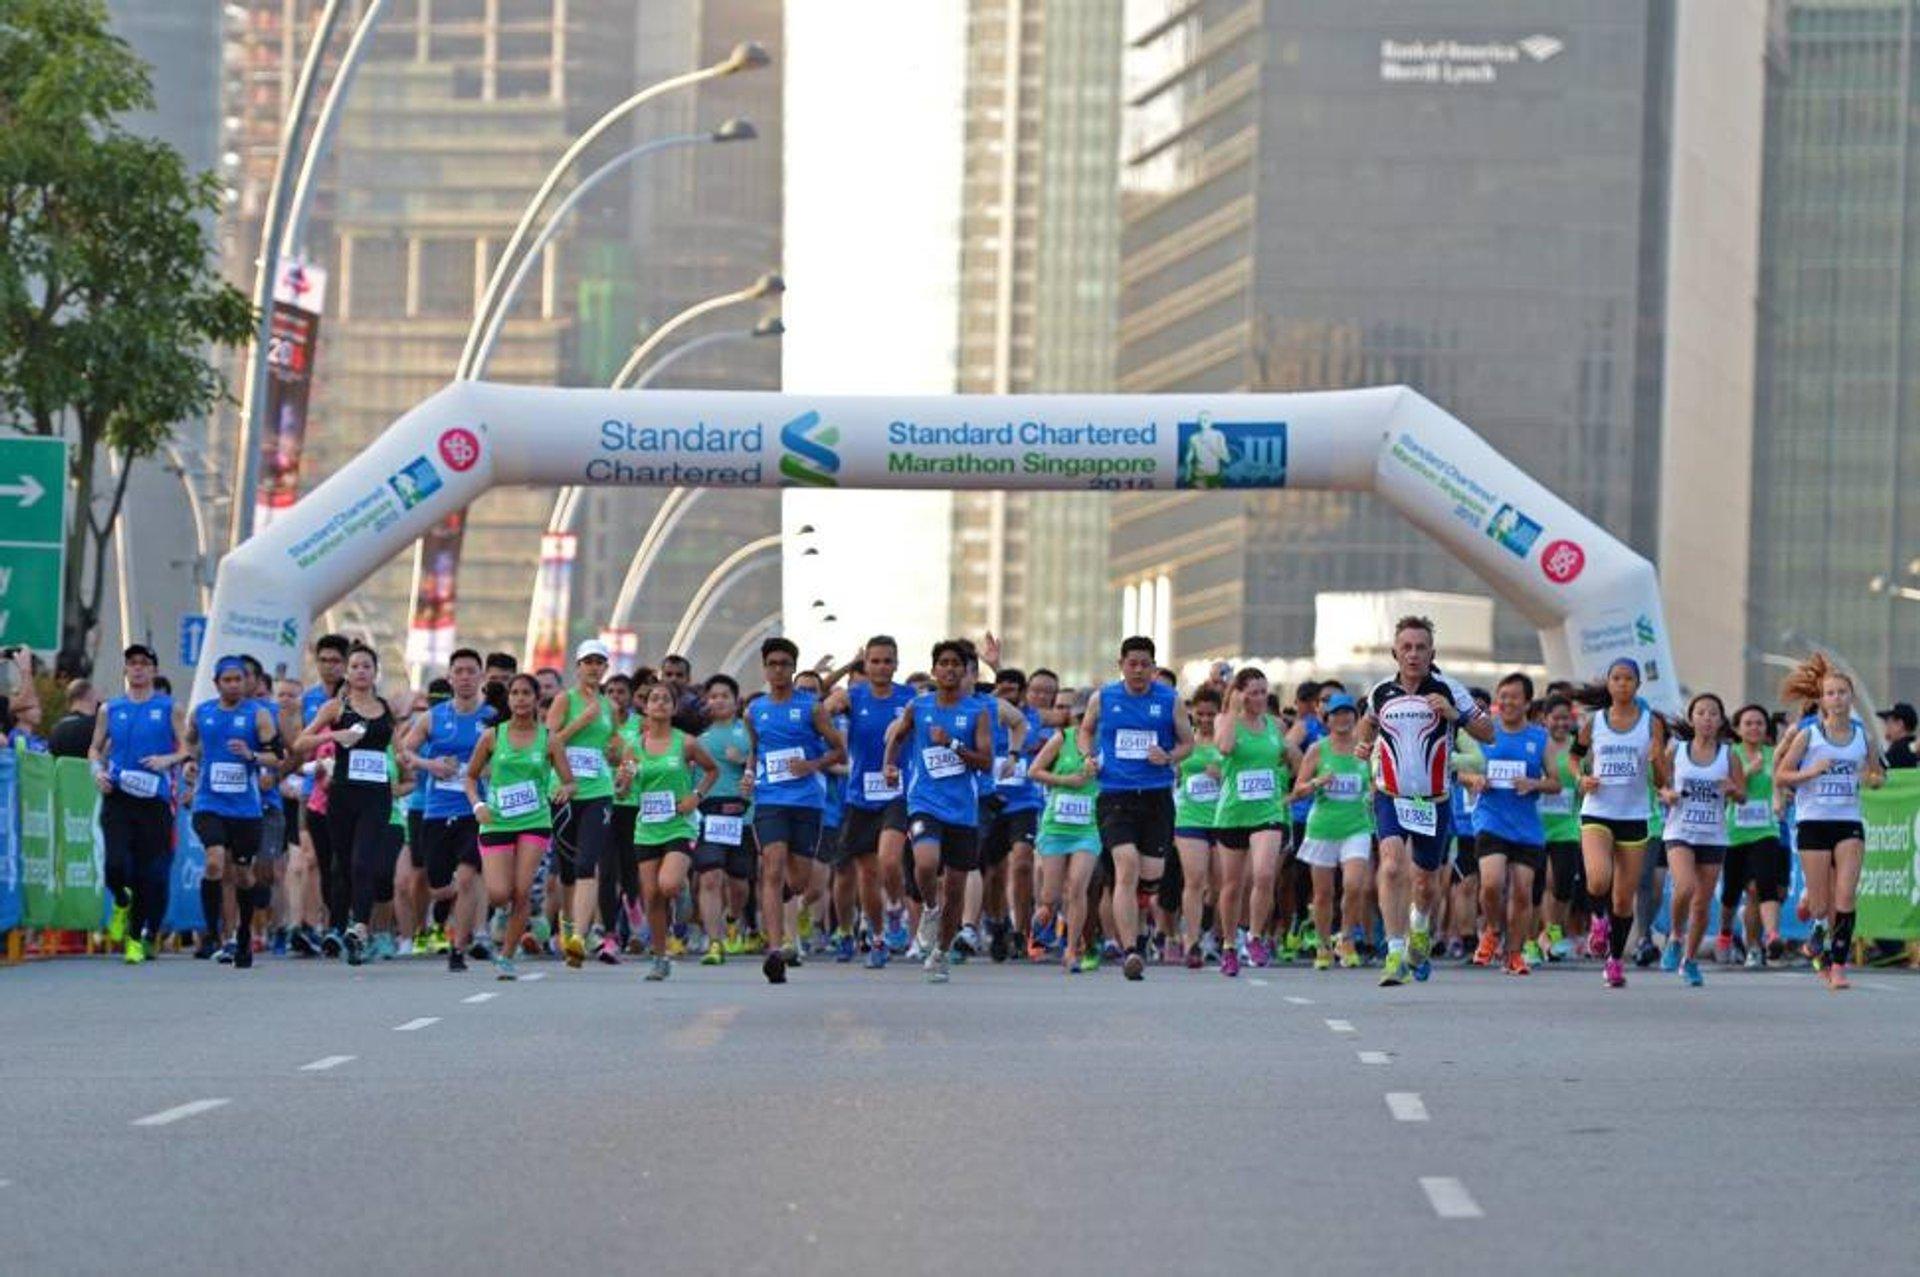 Standard Chartered Marathon Singapore in Singapore - Best Season 2019